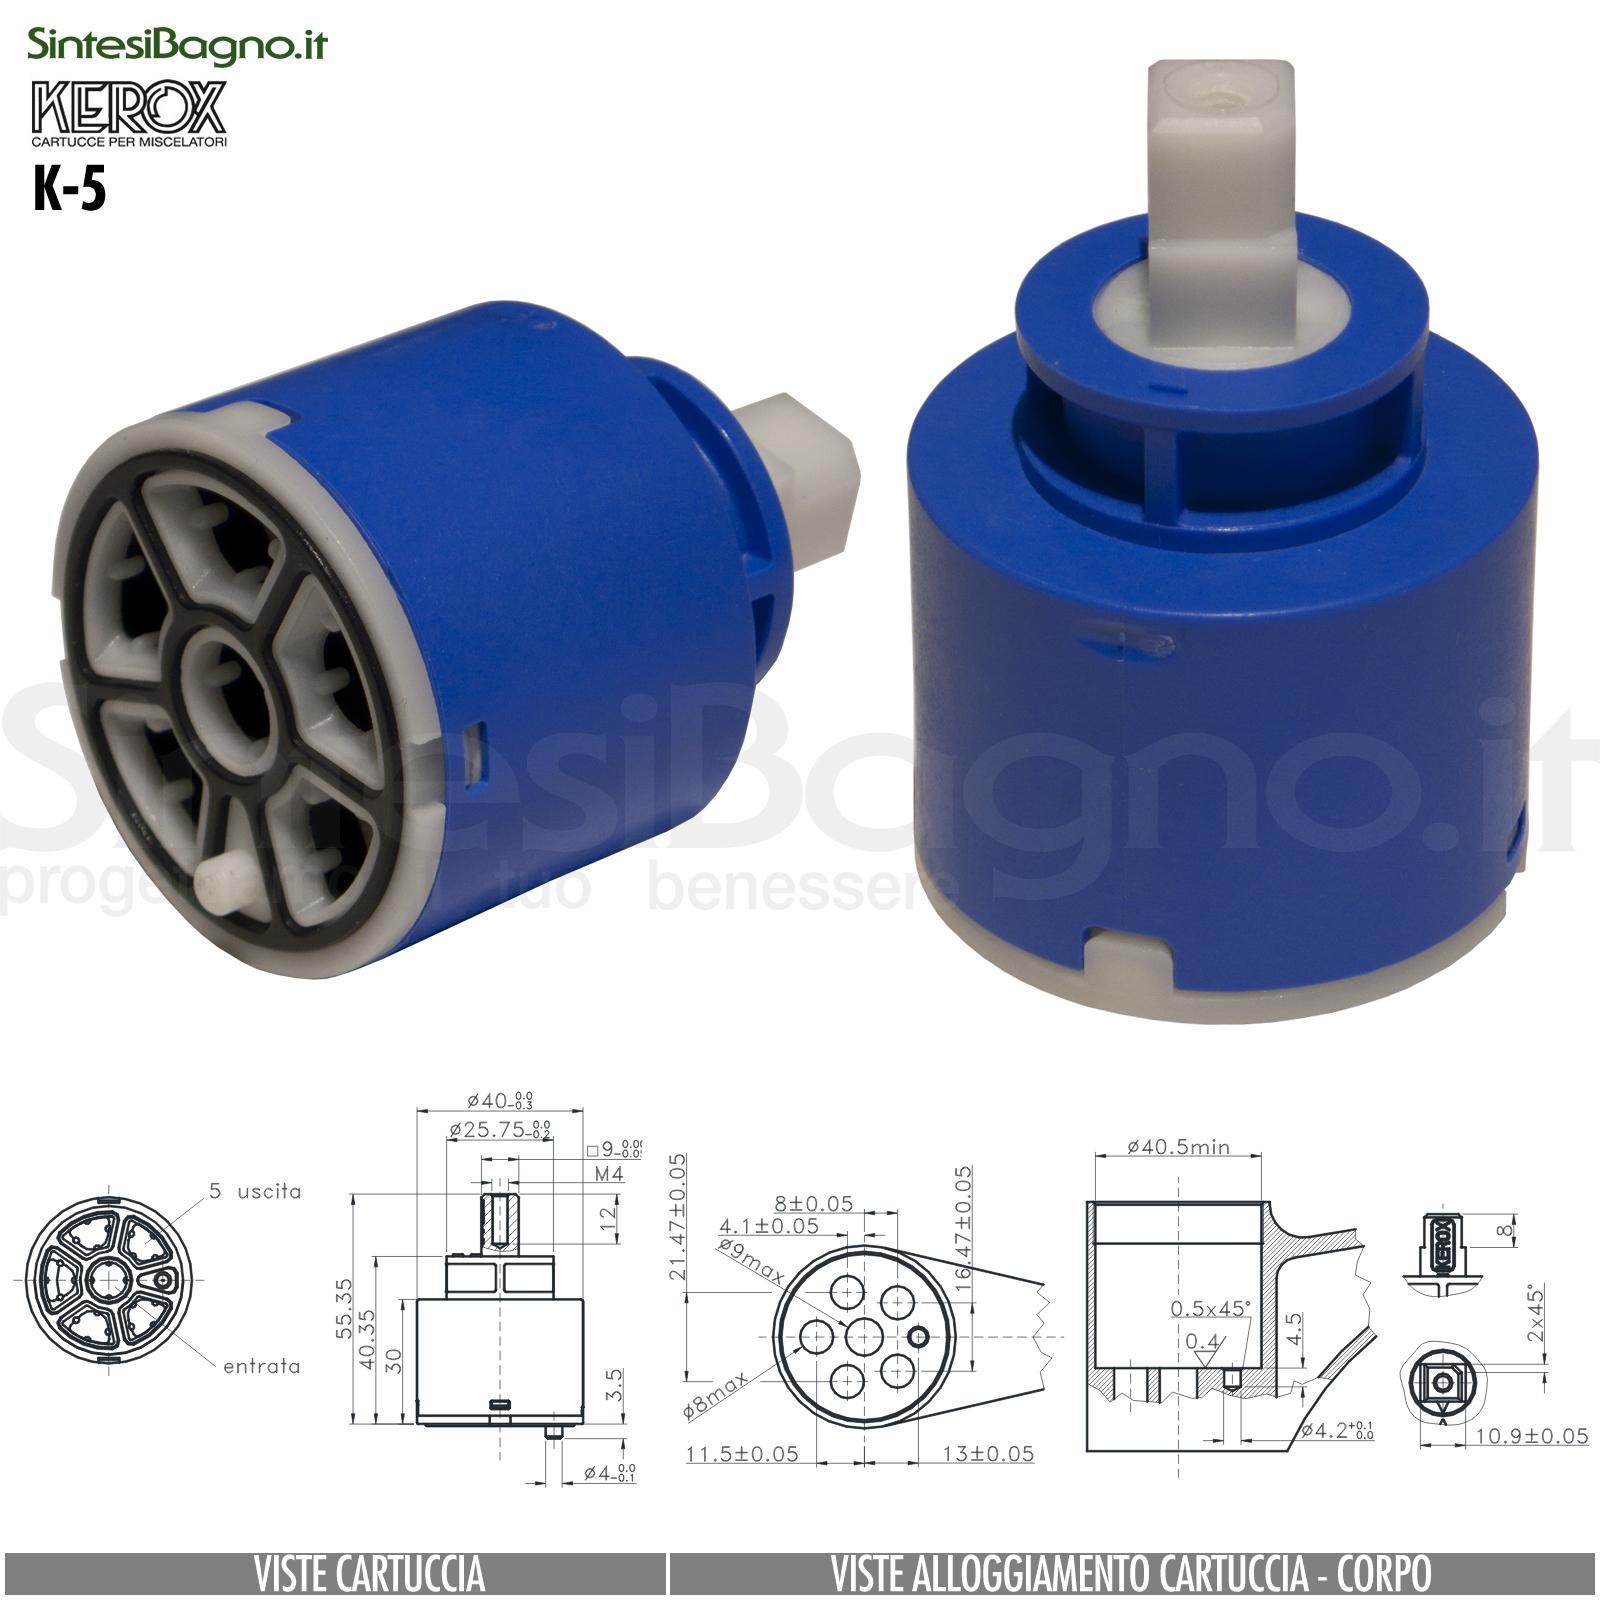 K5-cartuccia-deviatore-a-5-vie-diametro-40-mm-KEROX-K-5